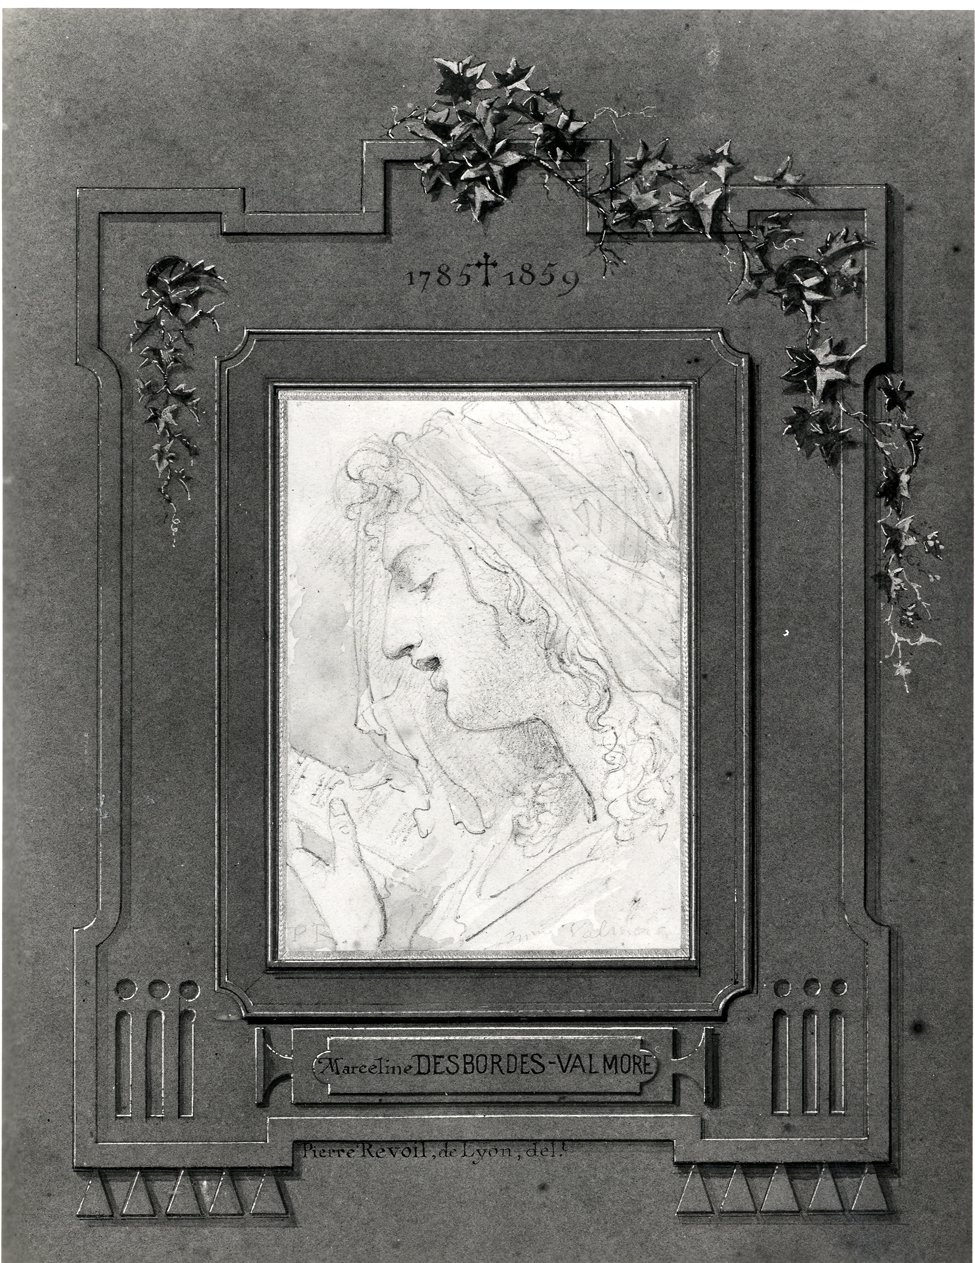 Ms 1848-16 MDV par Revoil